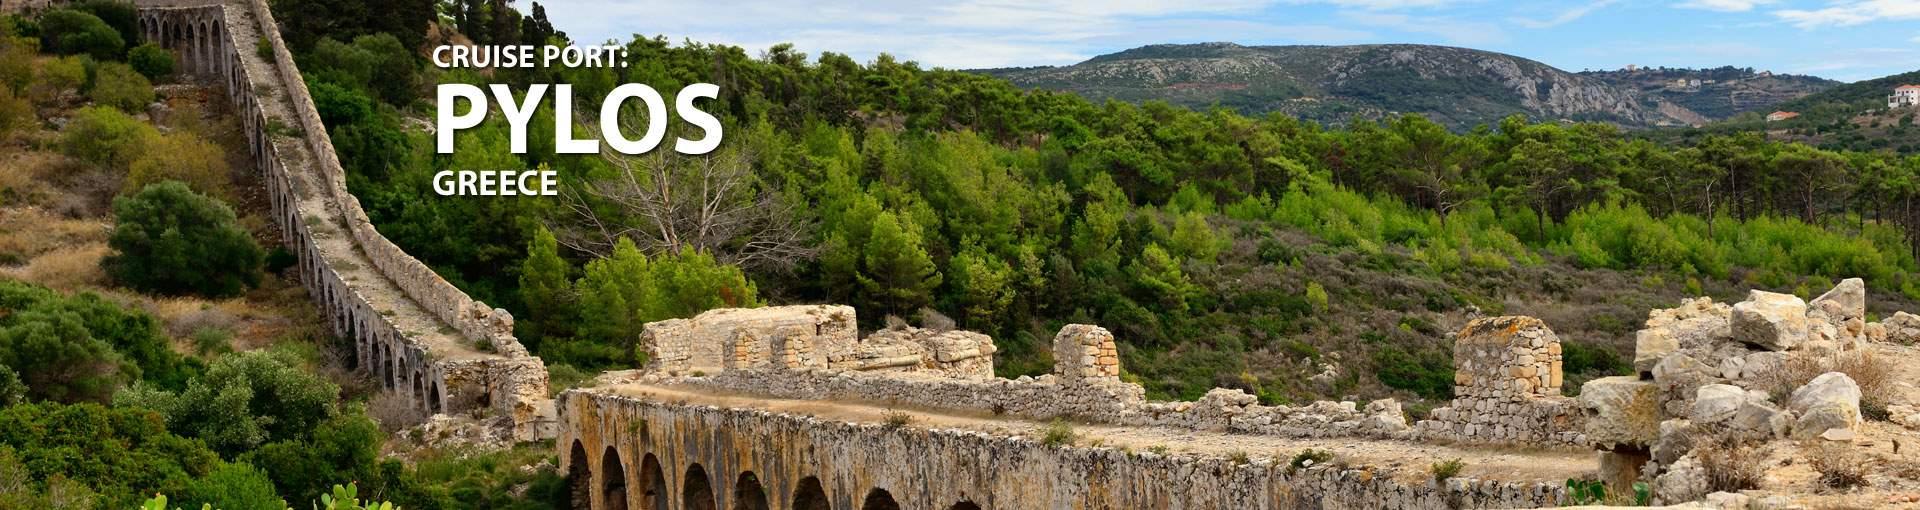 Cruises to Pylos, Greece